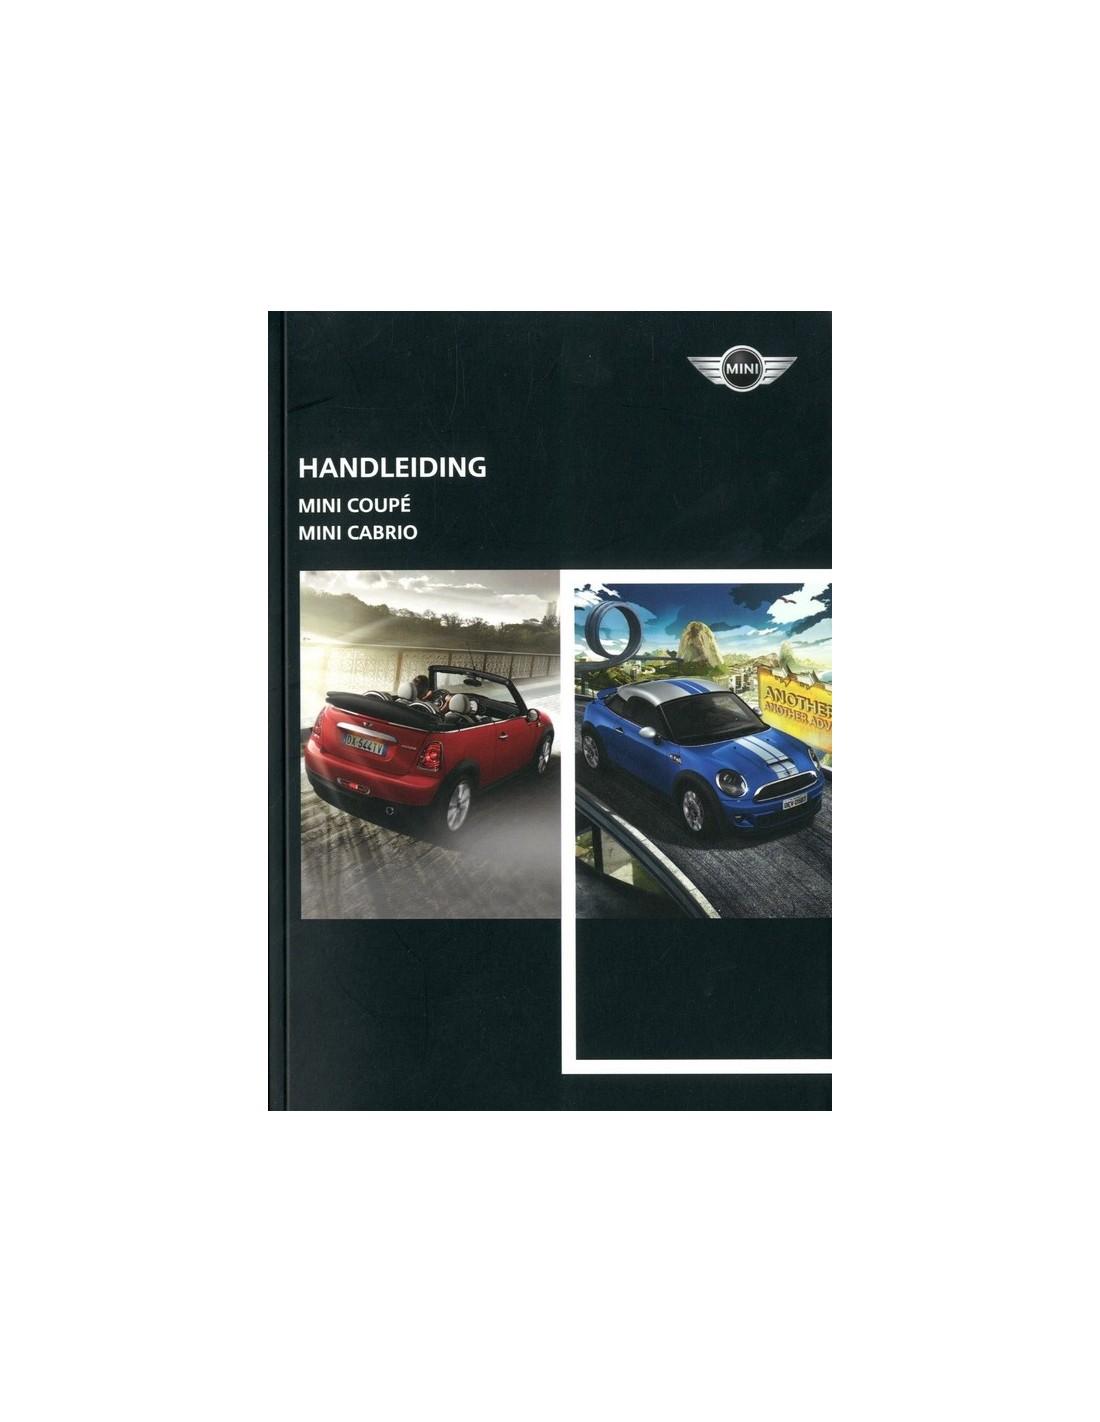 2011 austin mini coupe cabrio owner s manual dutch rh autolit eu